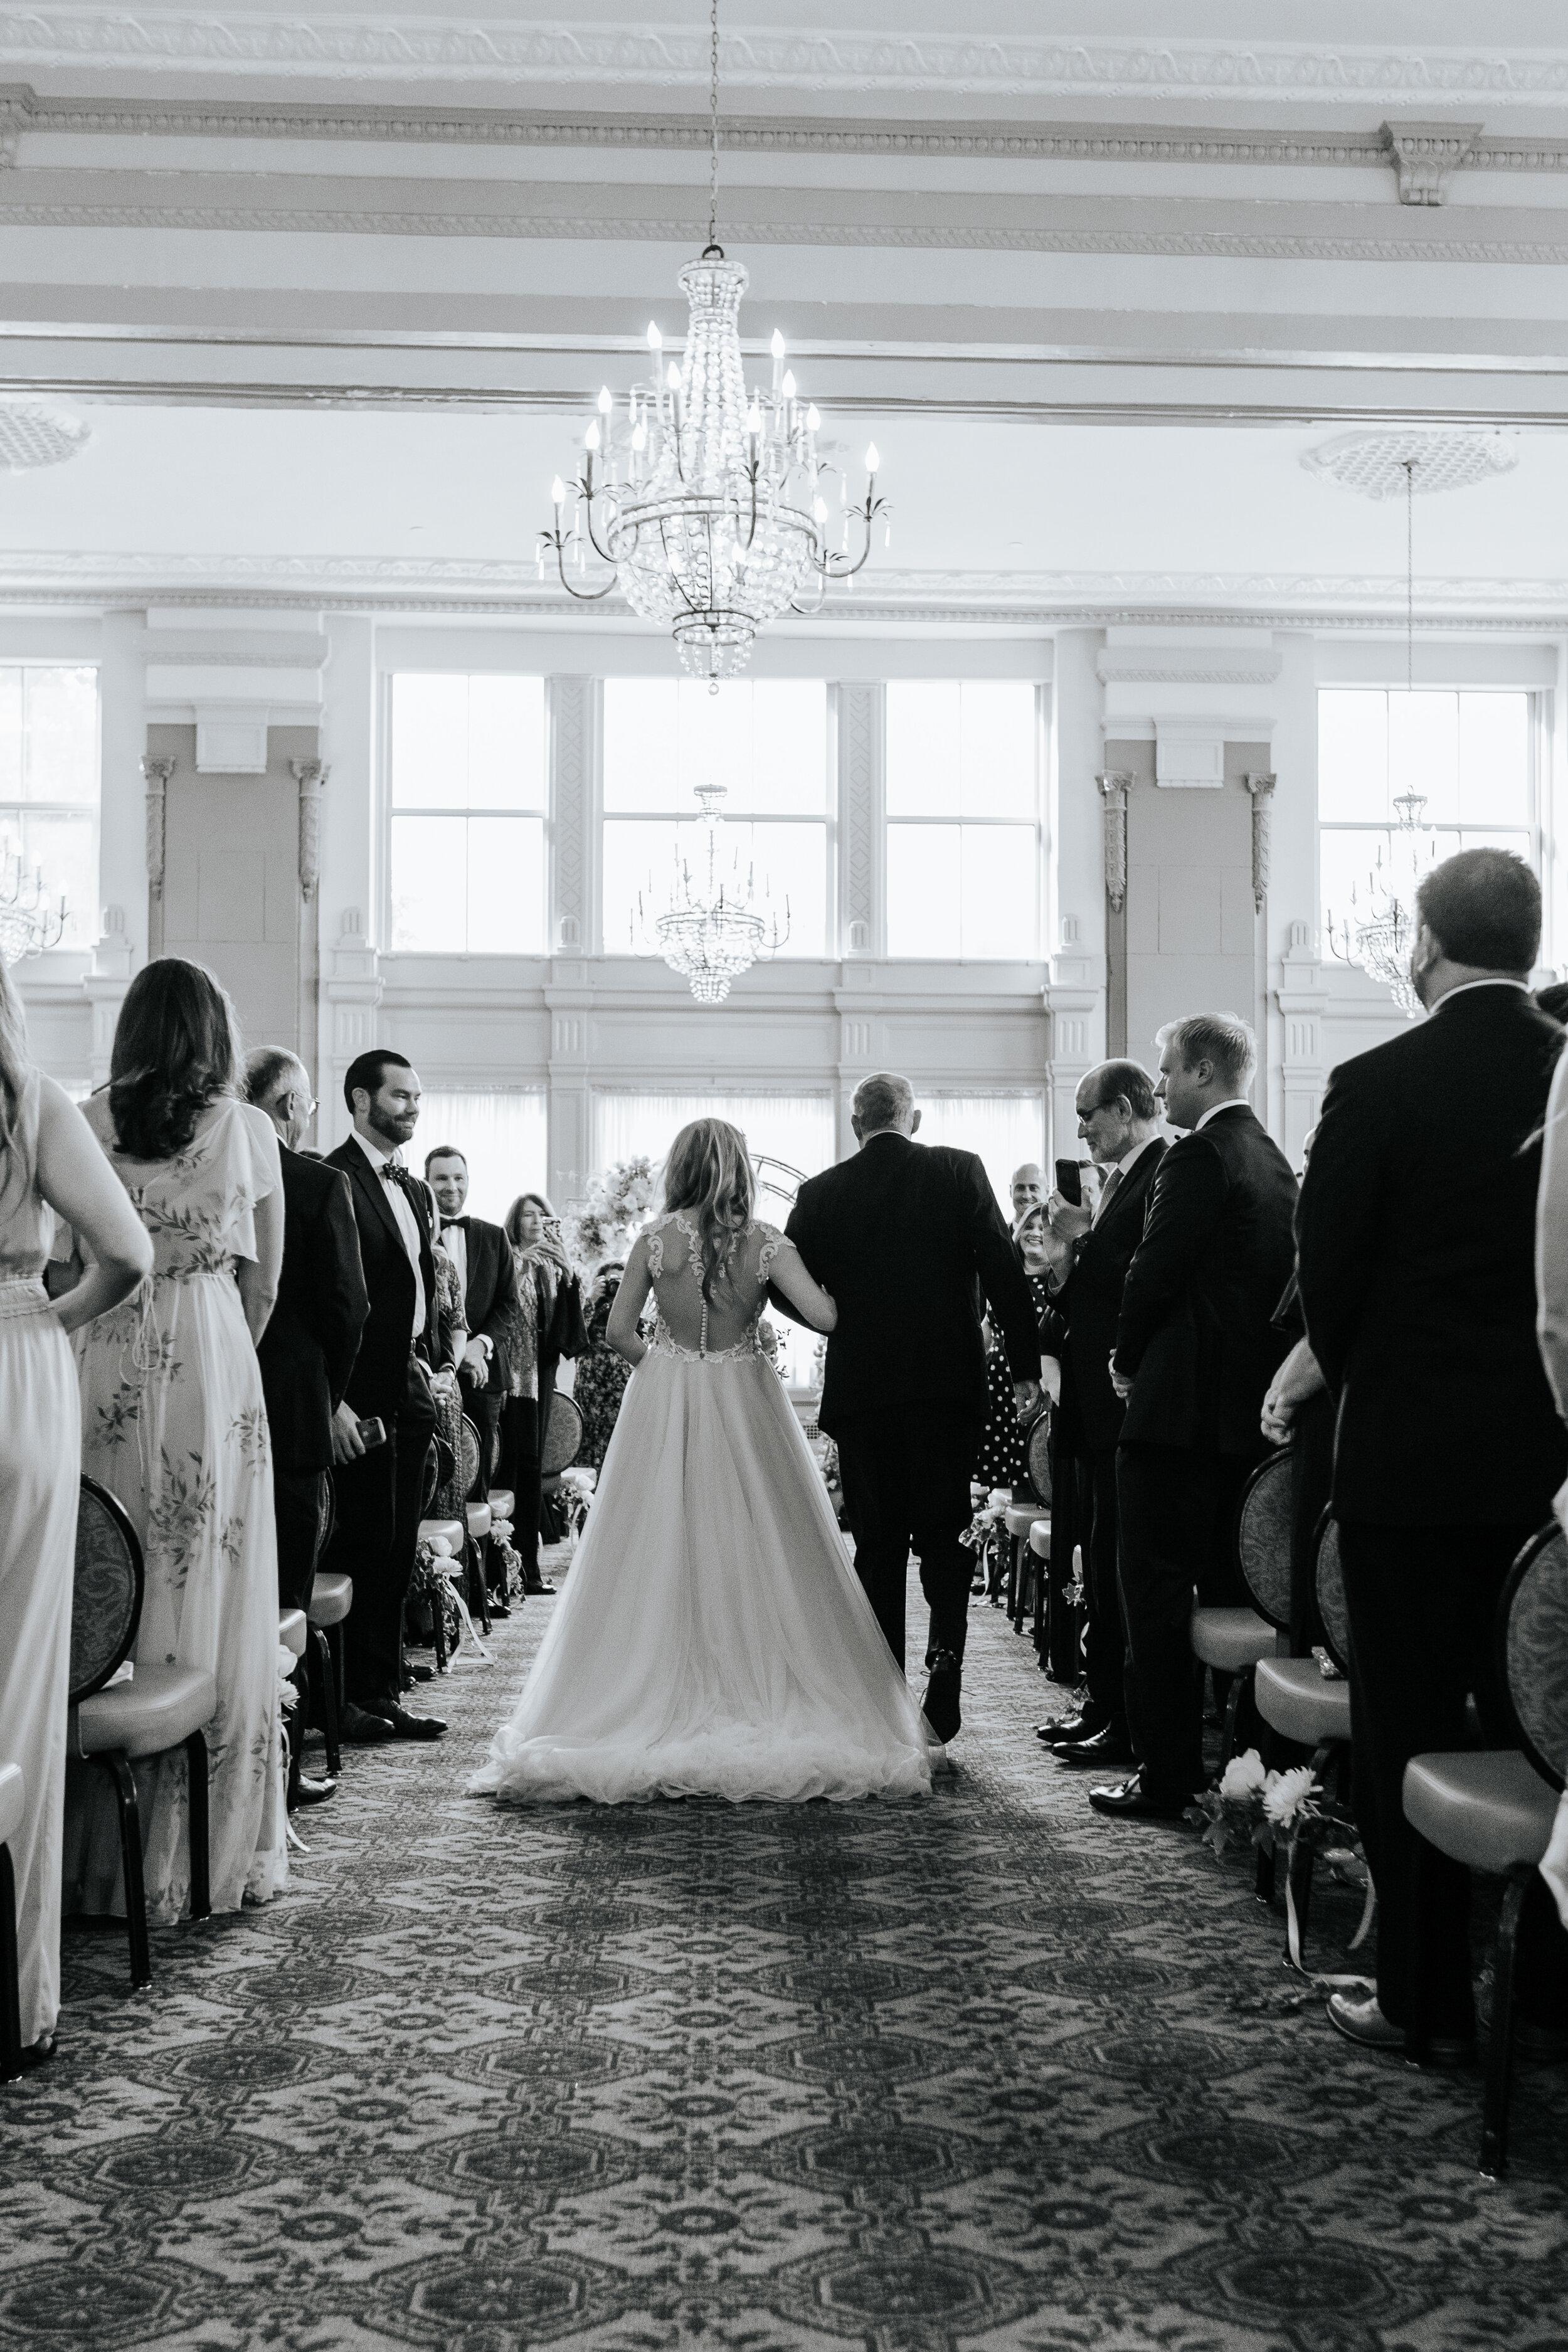 Cassie-Mrunal-Wedding-Quirk-Hotel-John-Marshall-Ballrooms-Richmond-Virginia-Photography-by-V-71.jpg